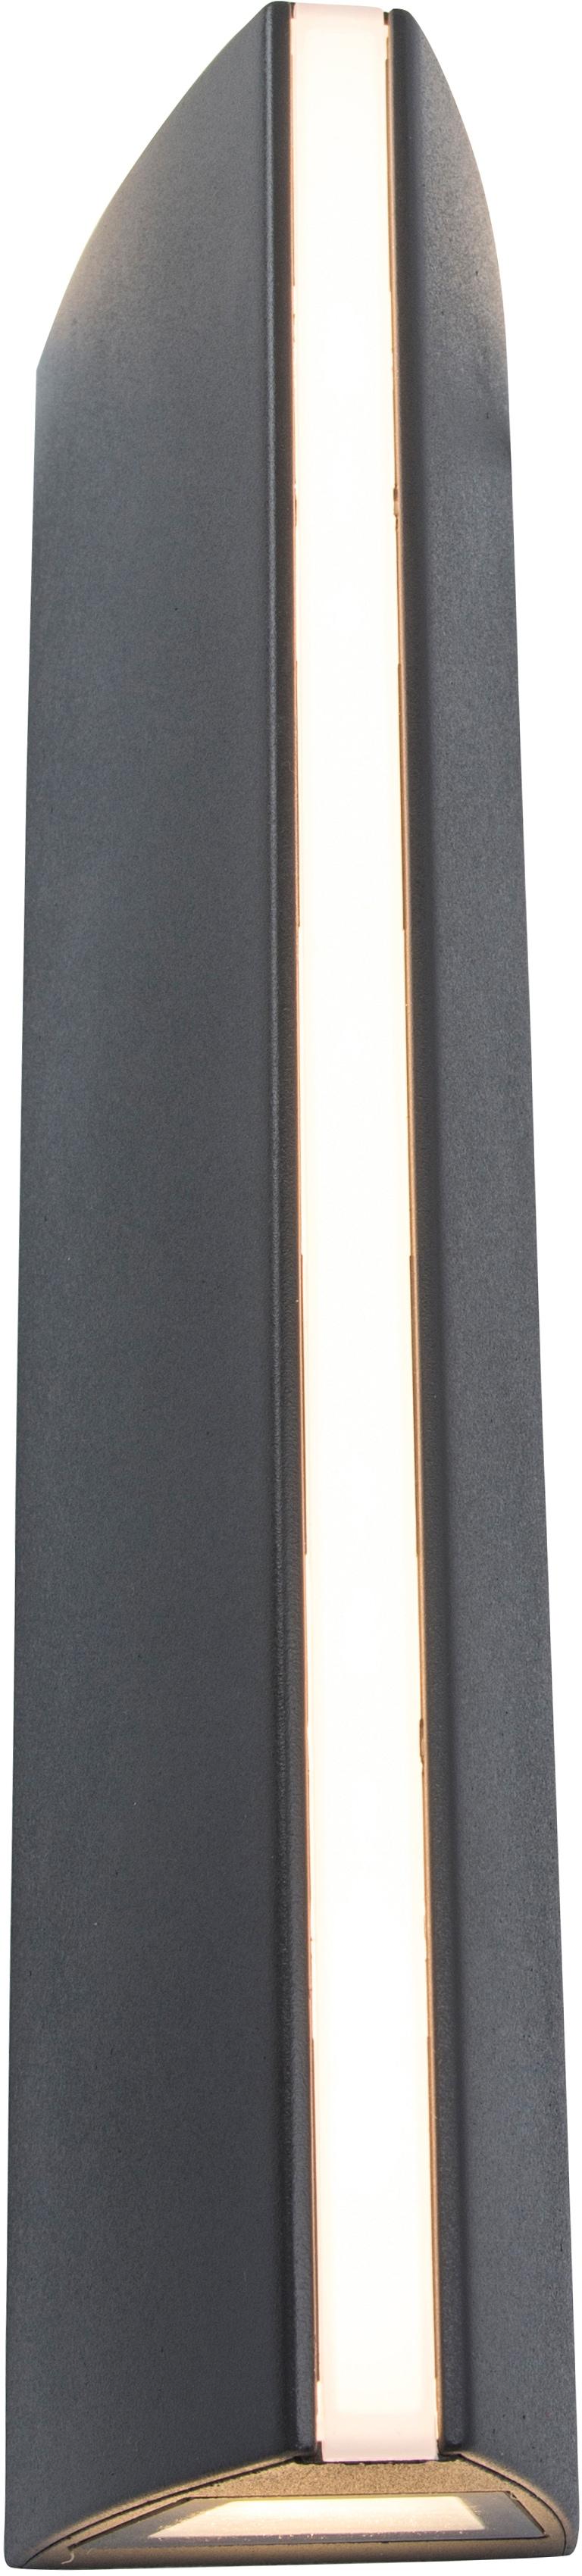 LUTEC LED Außen-Wandleuchte LEO 5192701335, LED-Modul, 1 St., Warmweiß